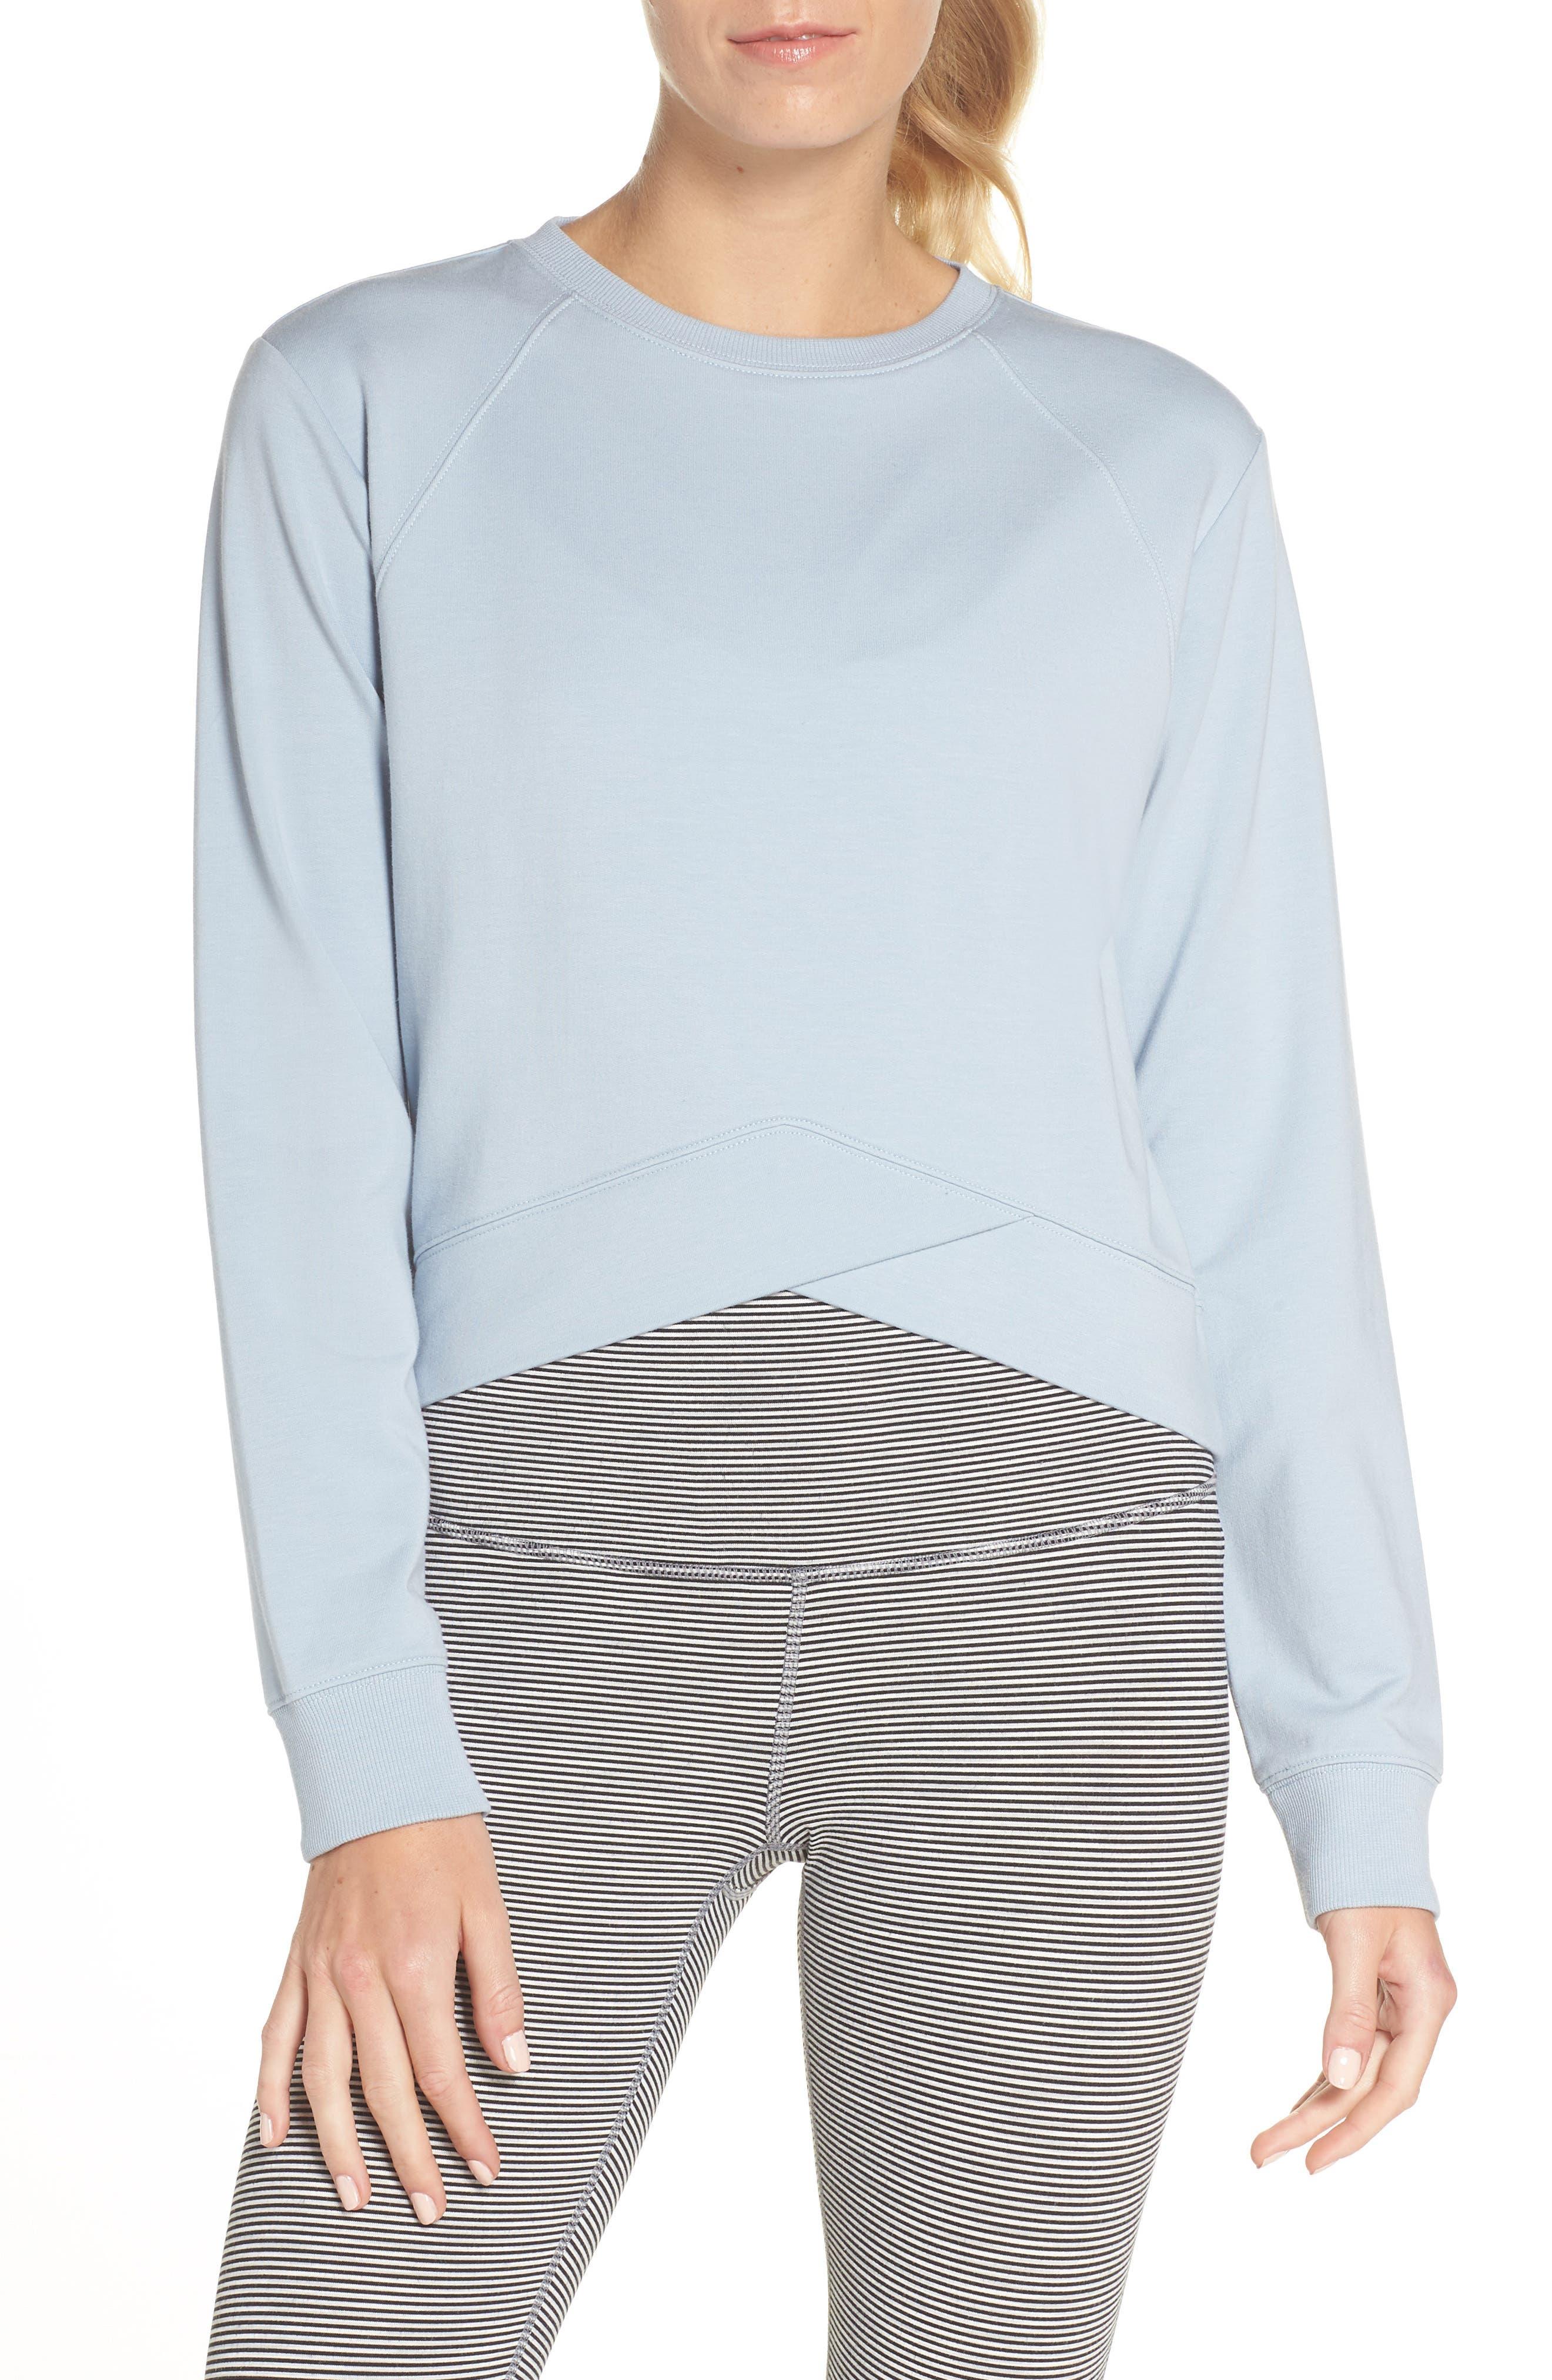 Uplifted Sweatshirt,                             Main thumbnail 1, color,                             420